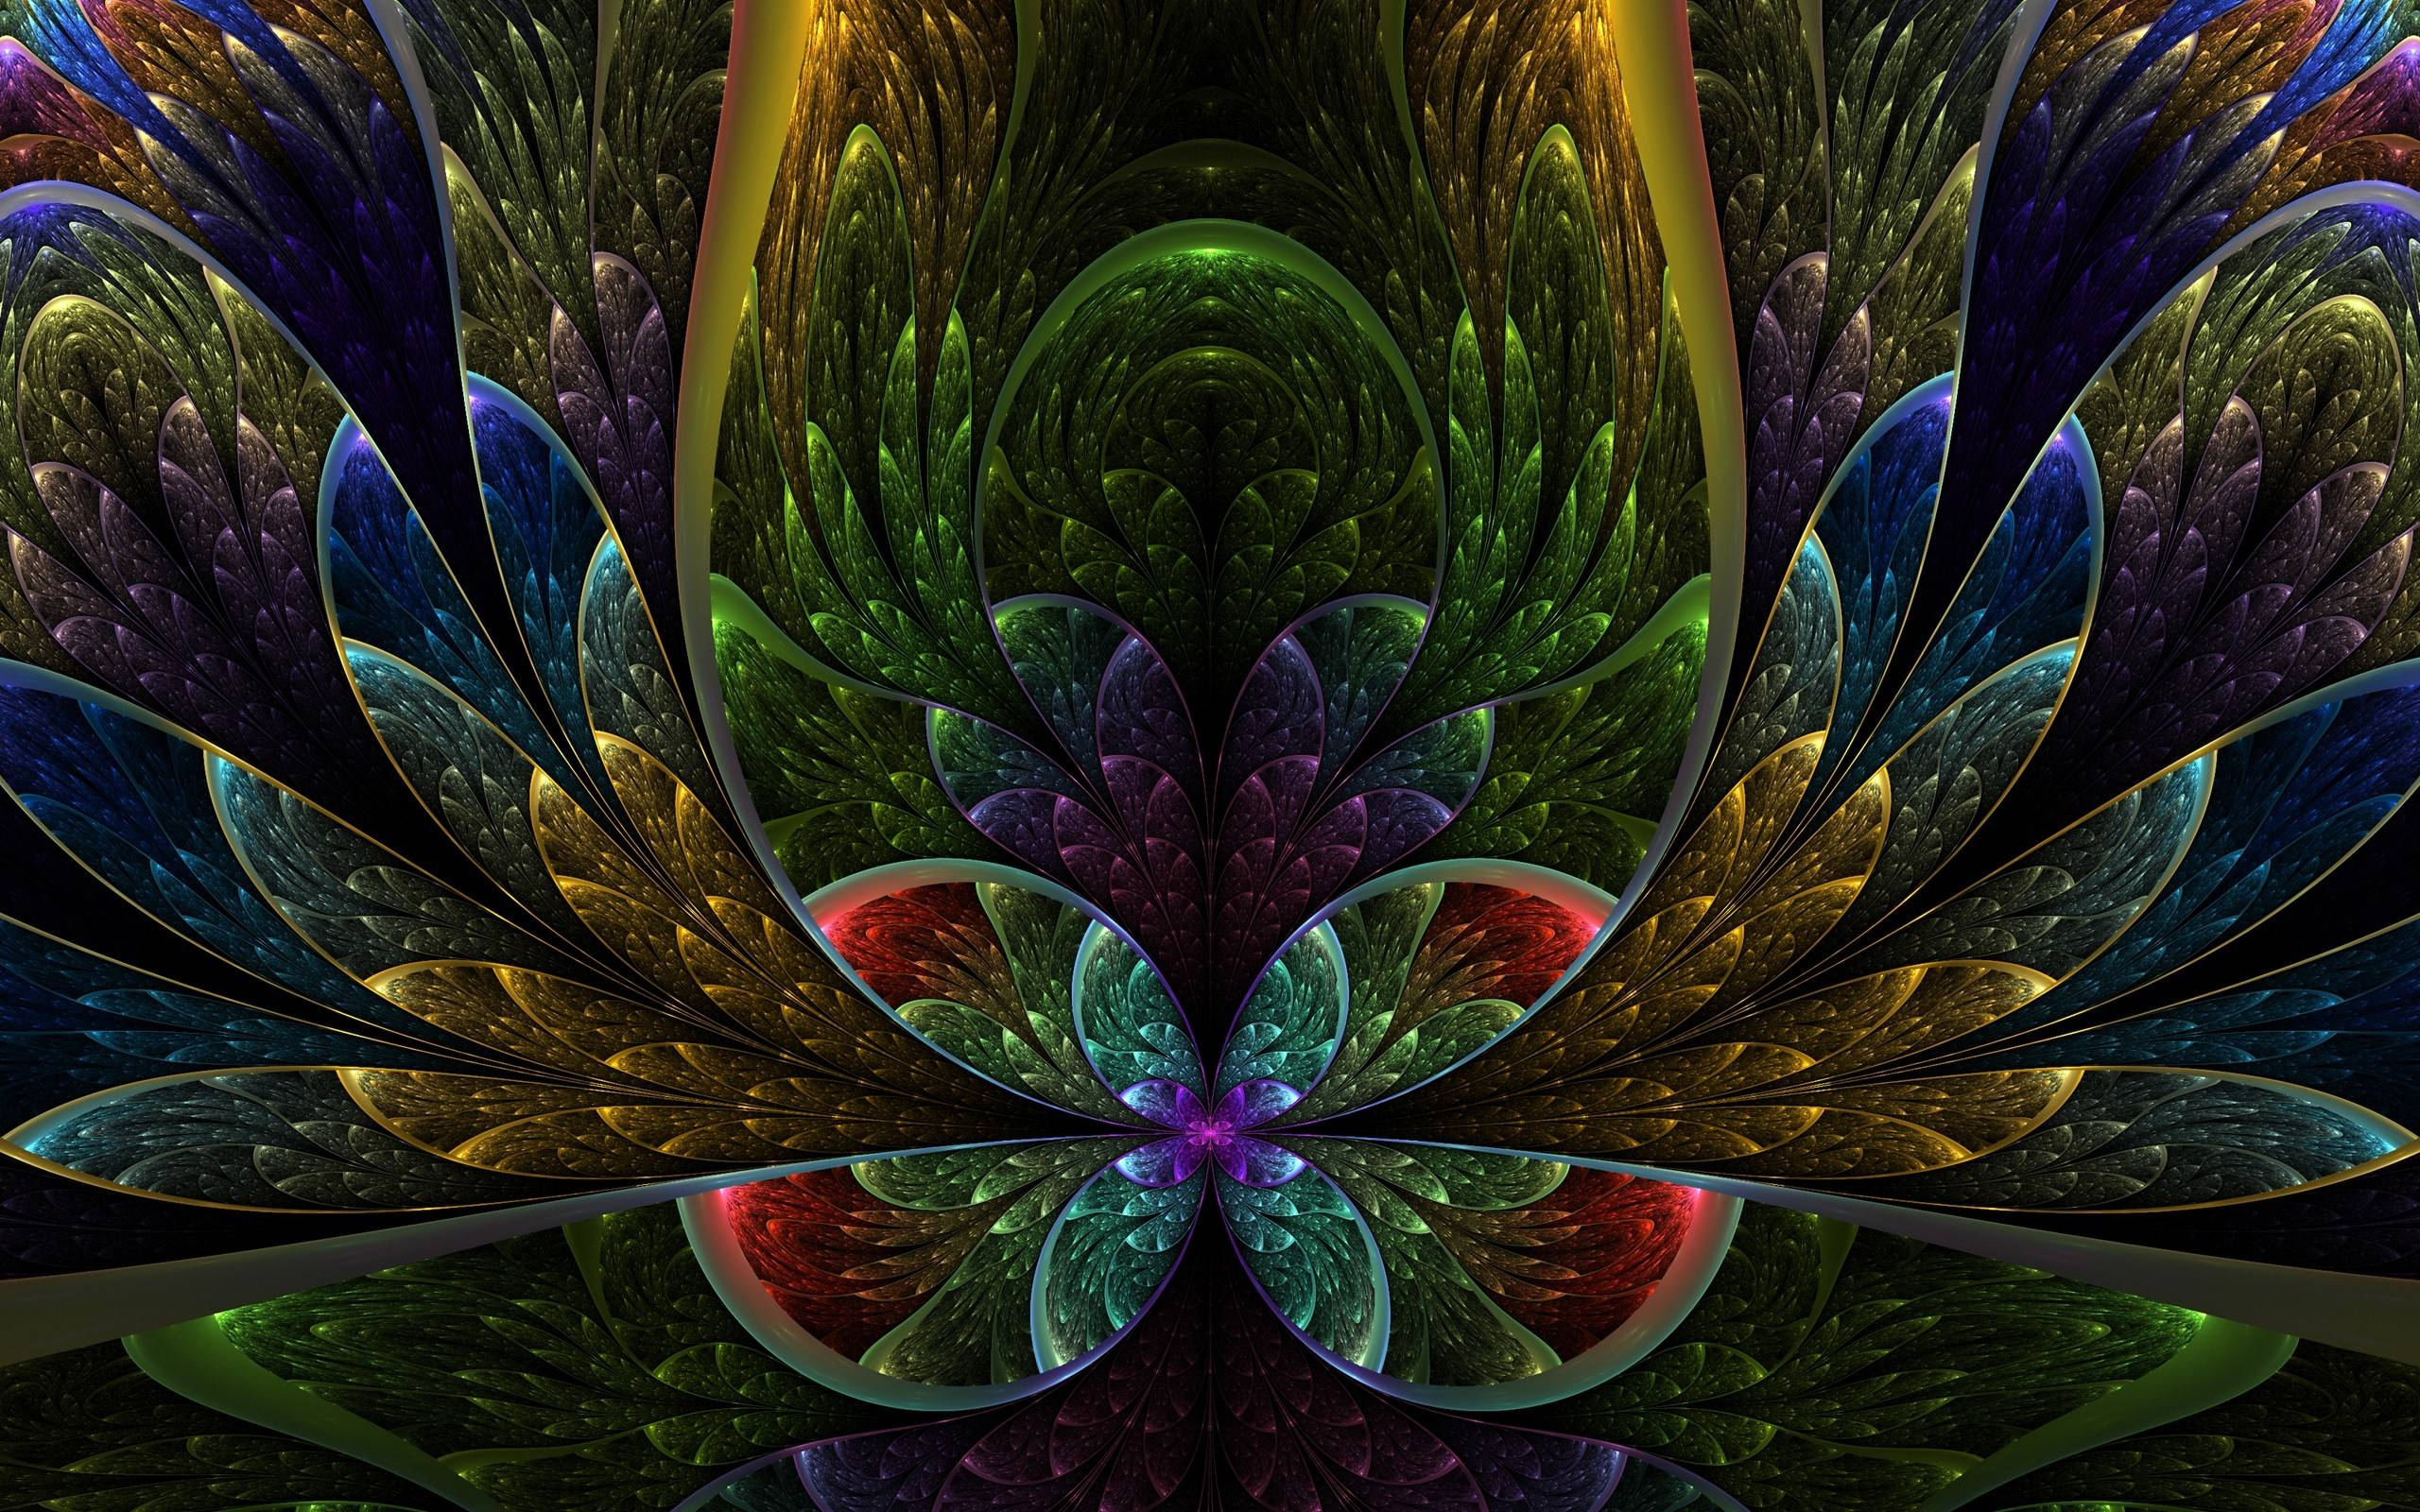 3d fractal wallpapers wallpaper cave for 3d wallpaper images